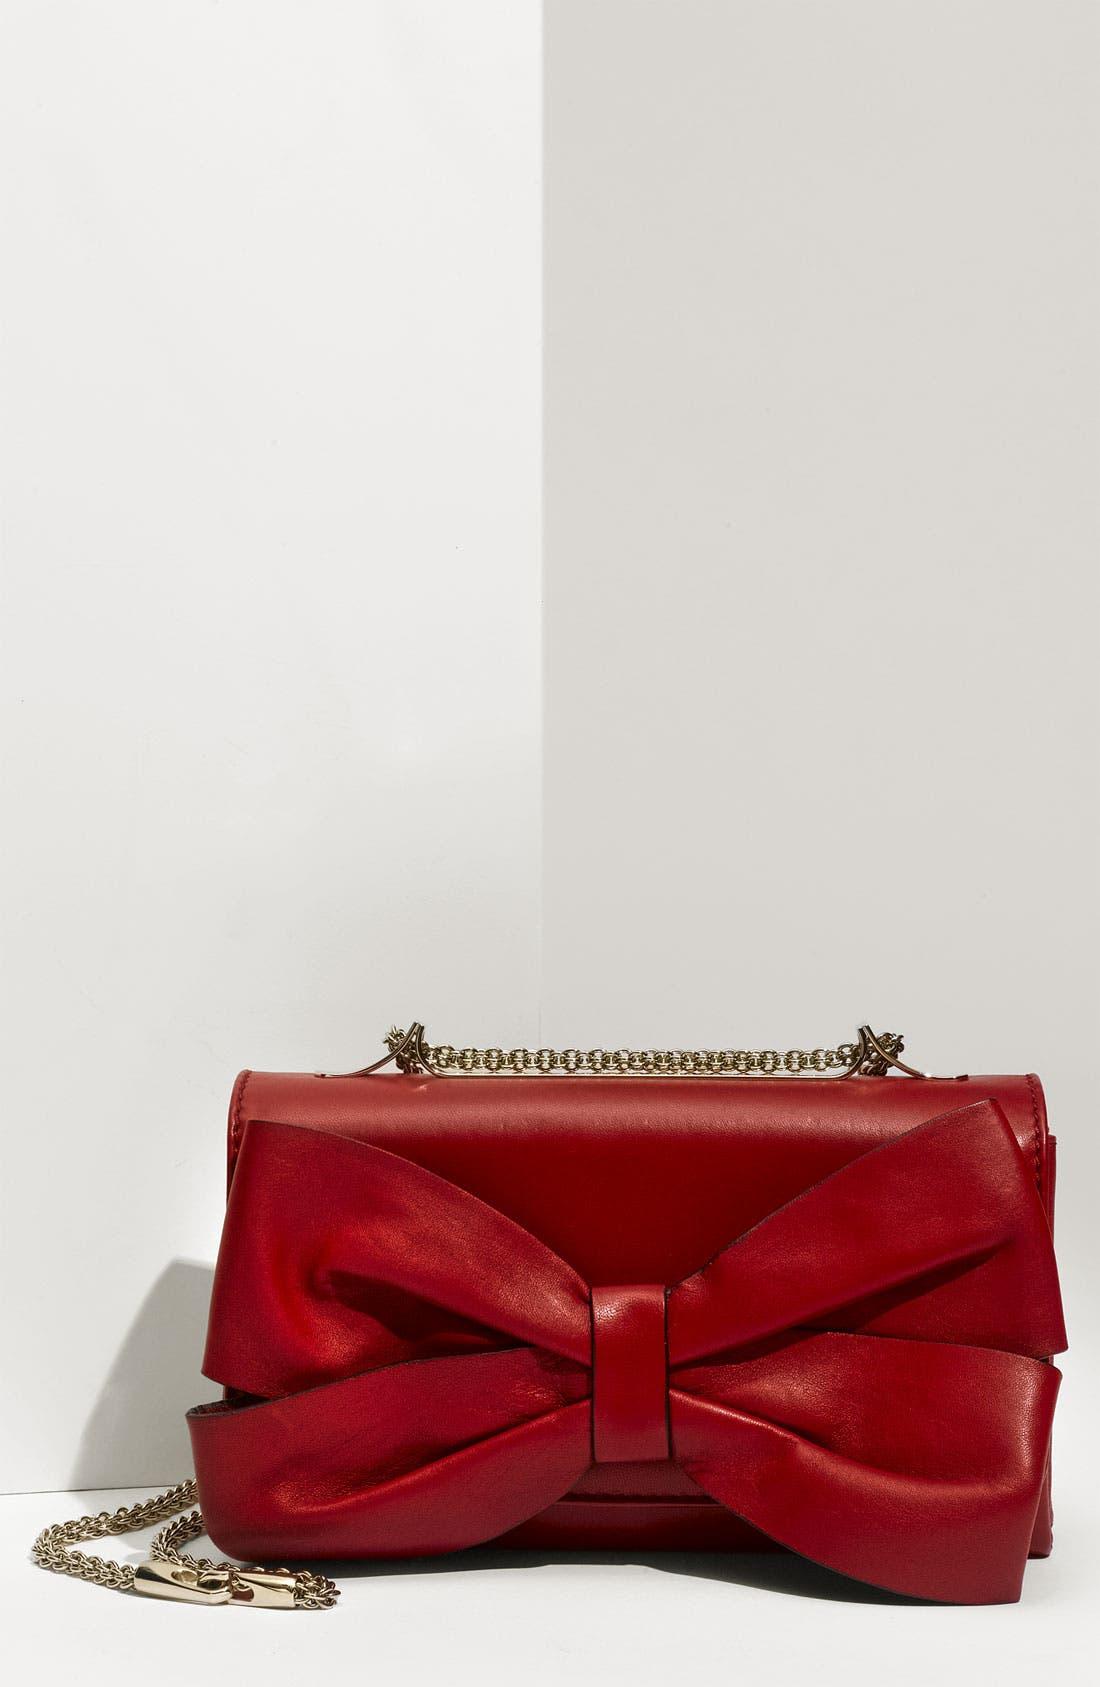 Alternate Image 1 Selected - Valentino 'Bow Flap' Leather Shoulder Bag